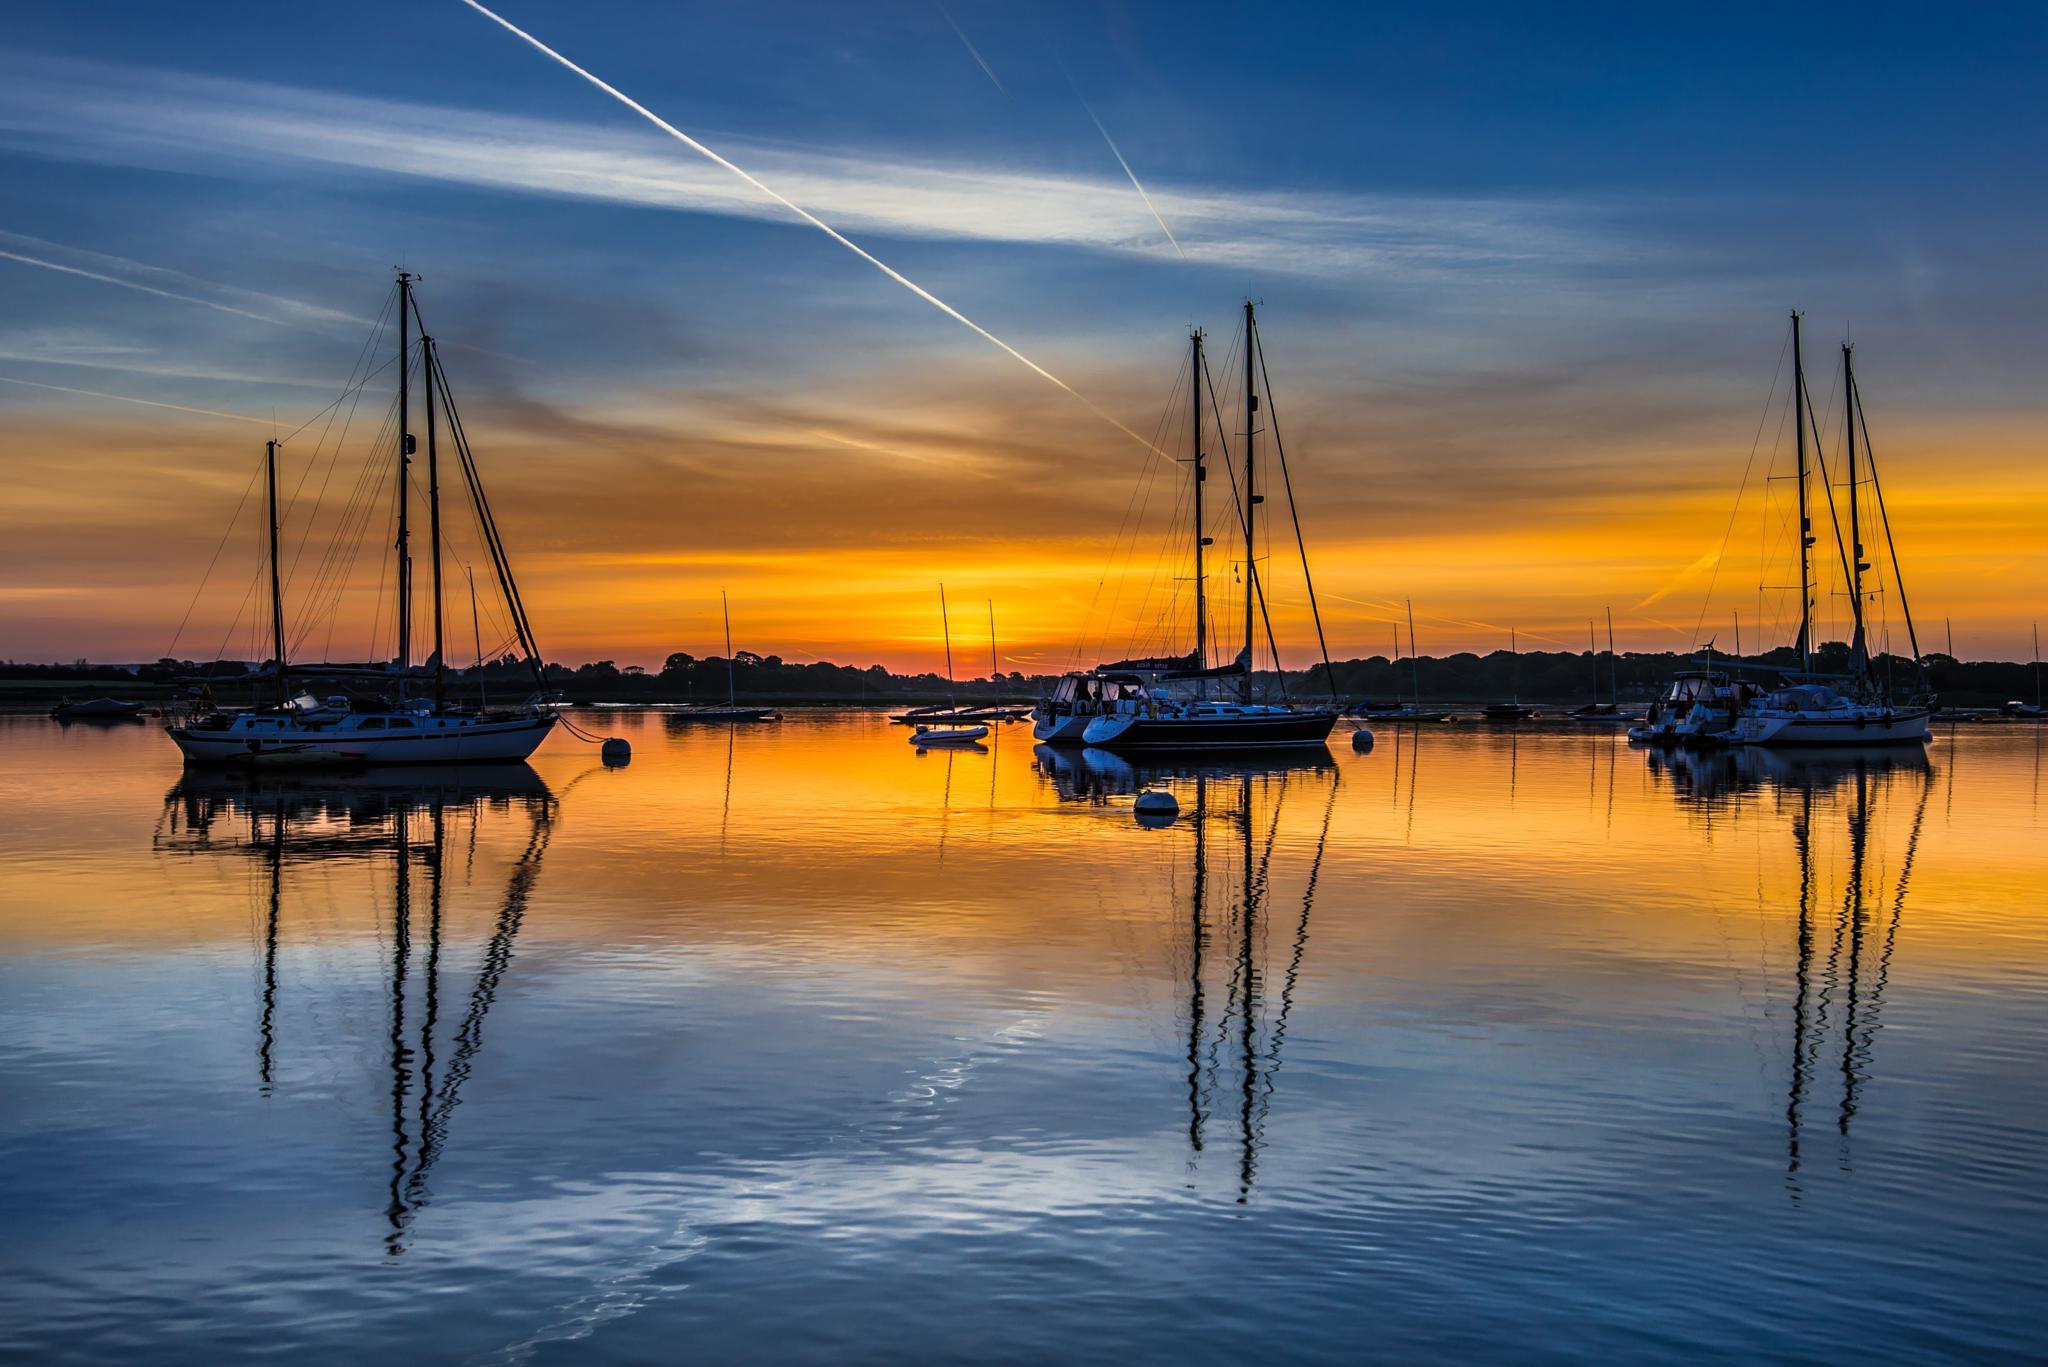 Photo in Landscape #stuartadamsphotography #dawn #boats #seascape #sussex #westsussex